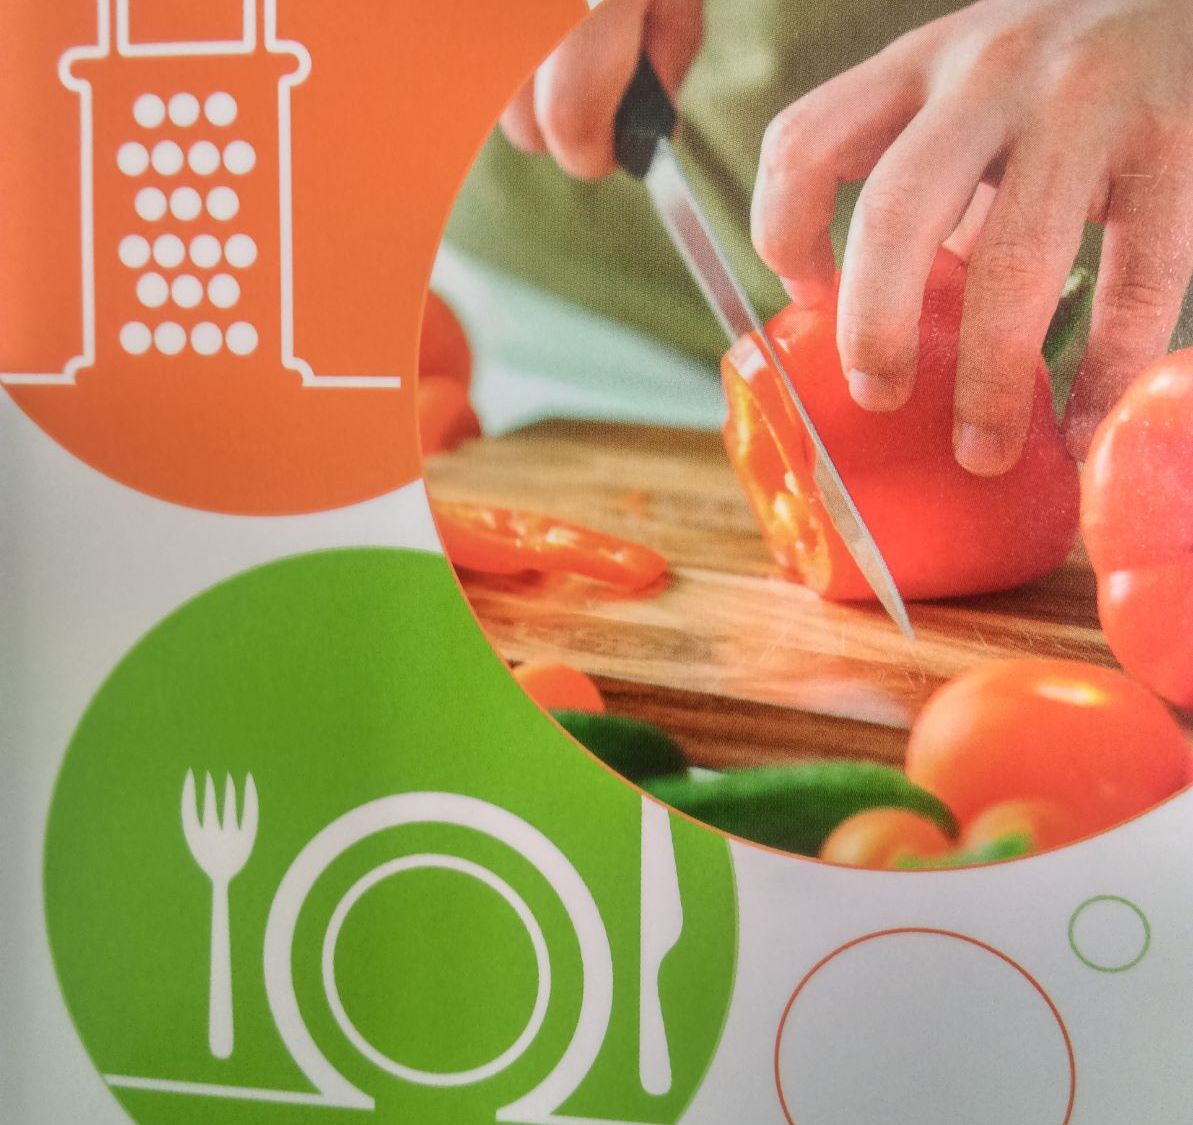 Food Science Revision Worksheets For Aqa Fpn